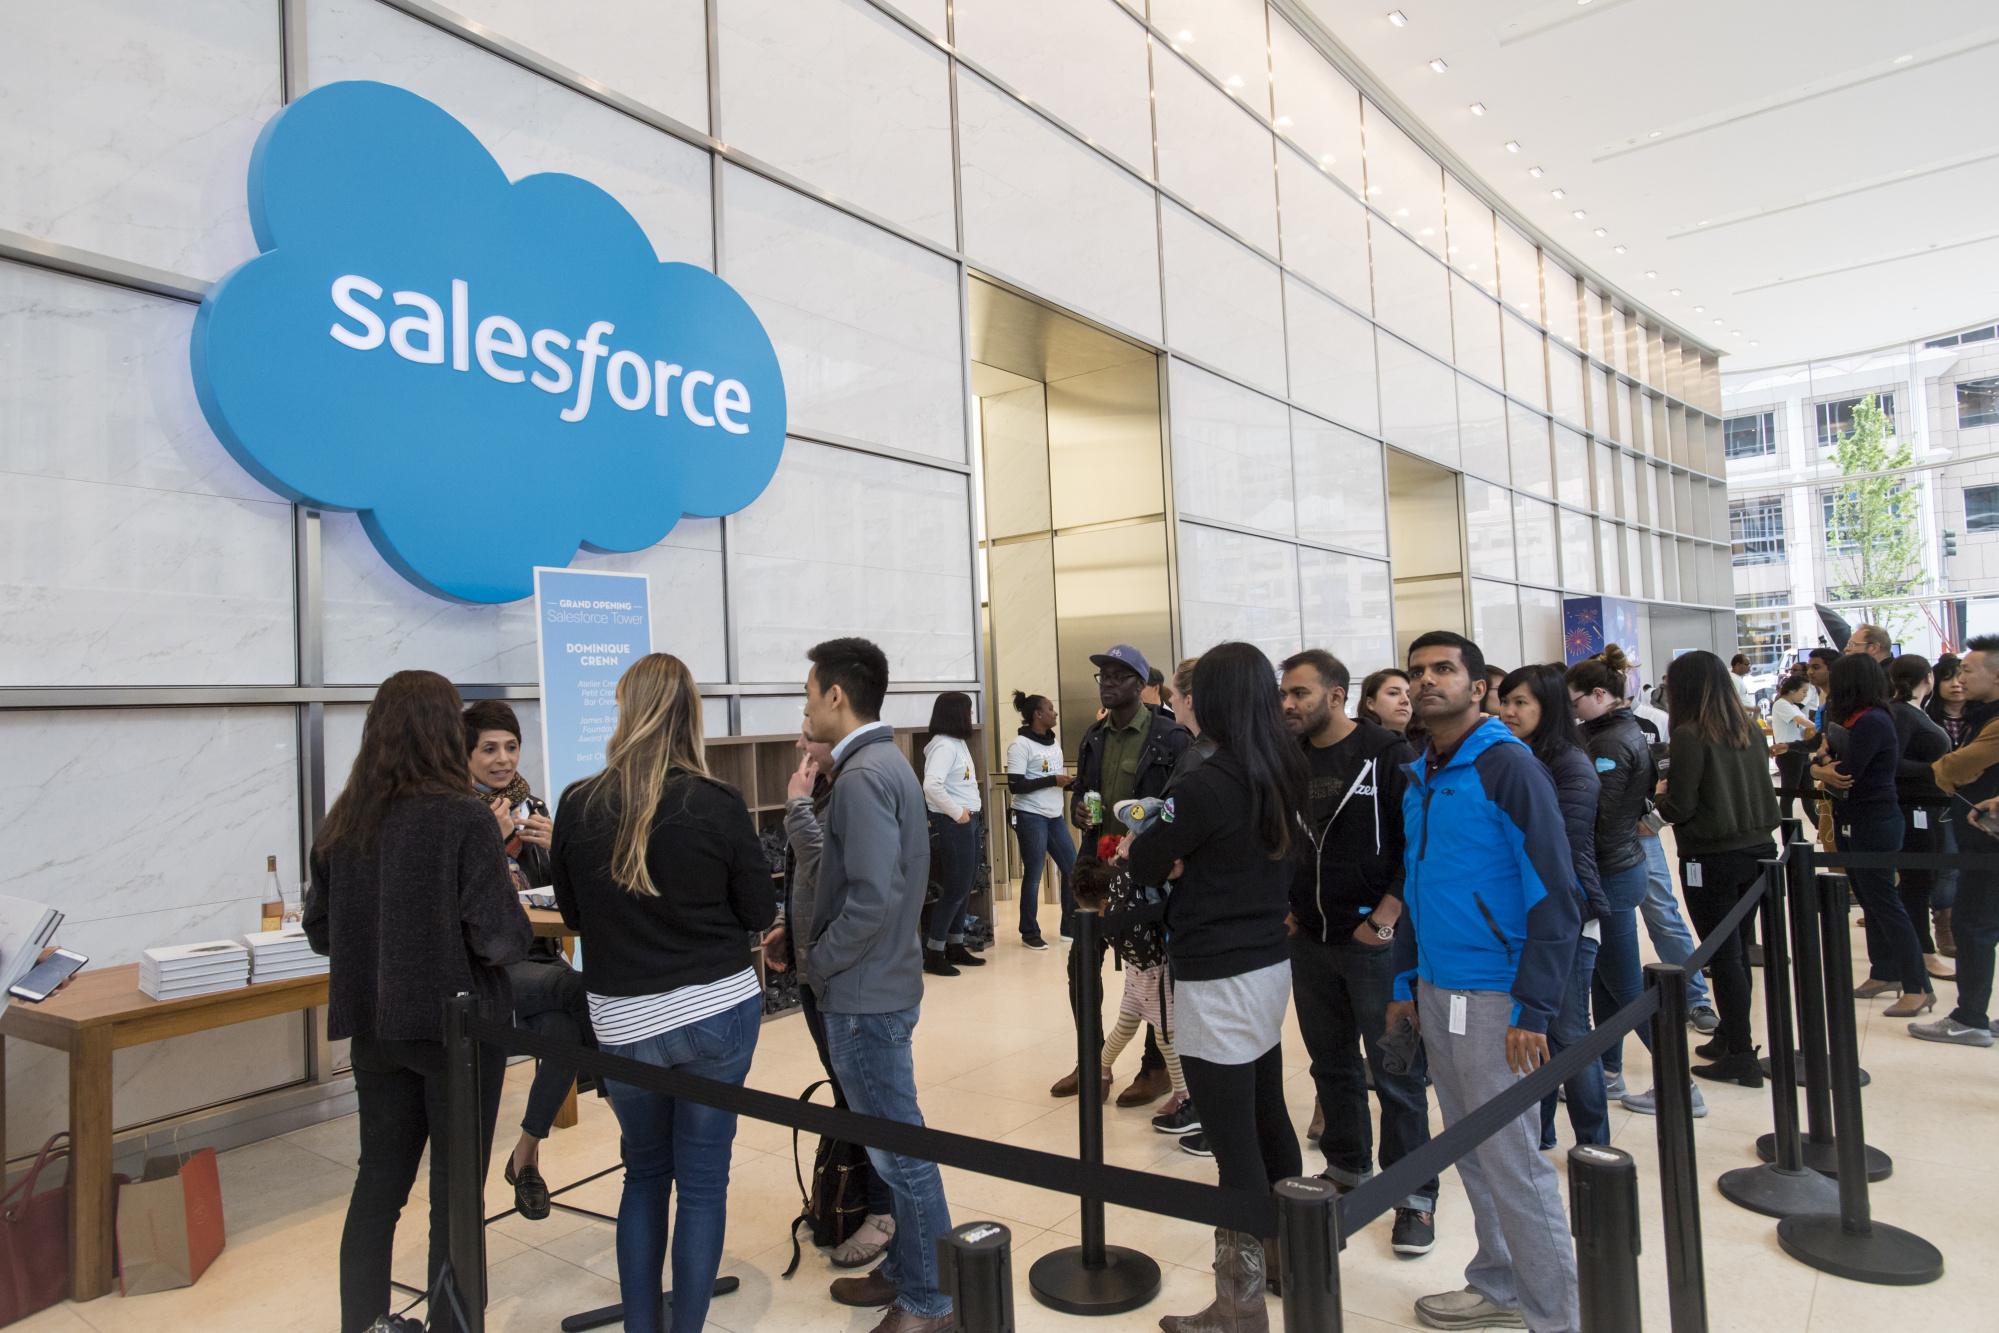 https://assets.sourcemedia.com/46/b5/f328f61b4460adde687106767d2b/salesforce.Bloomberg.jpg